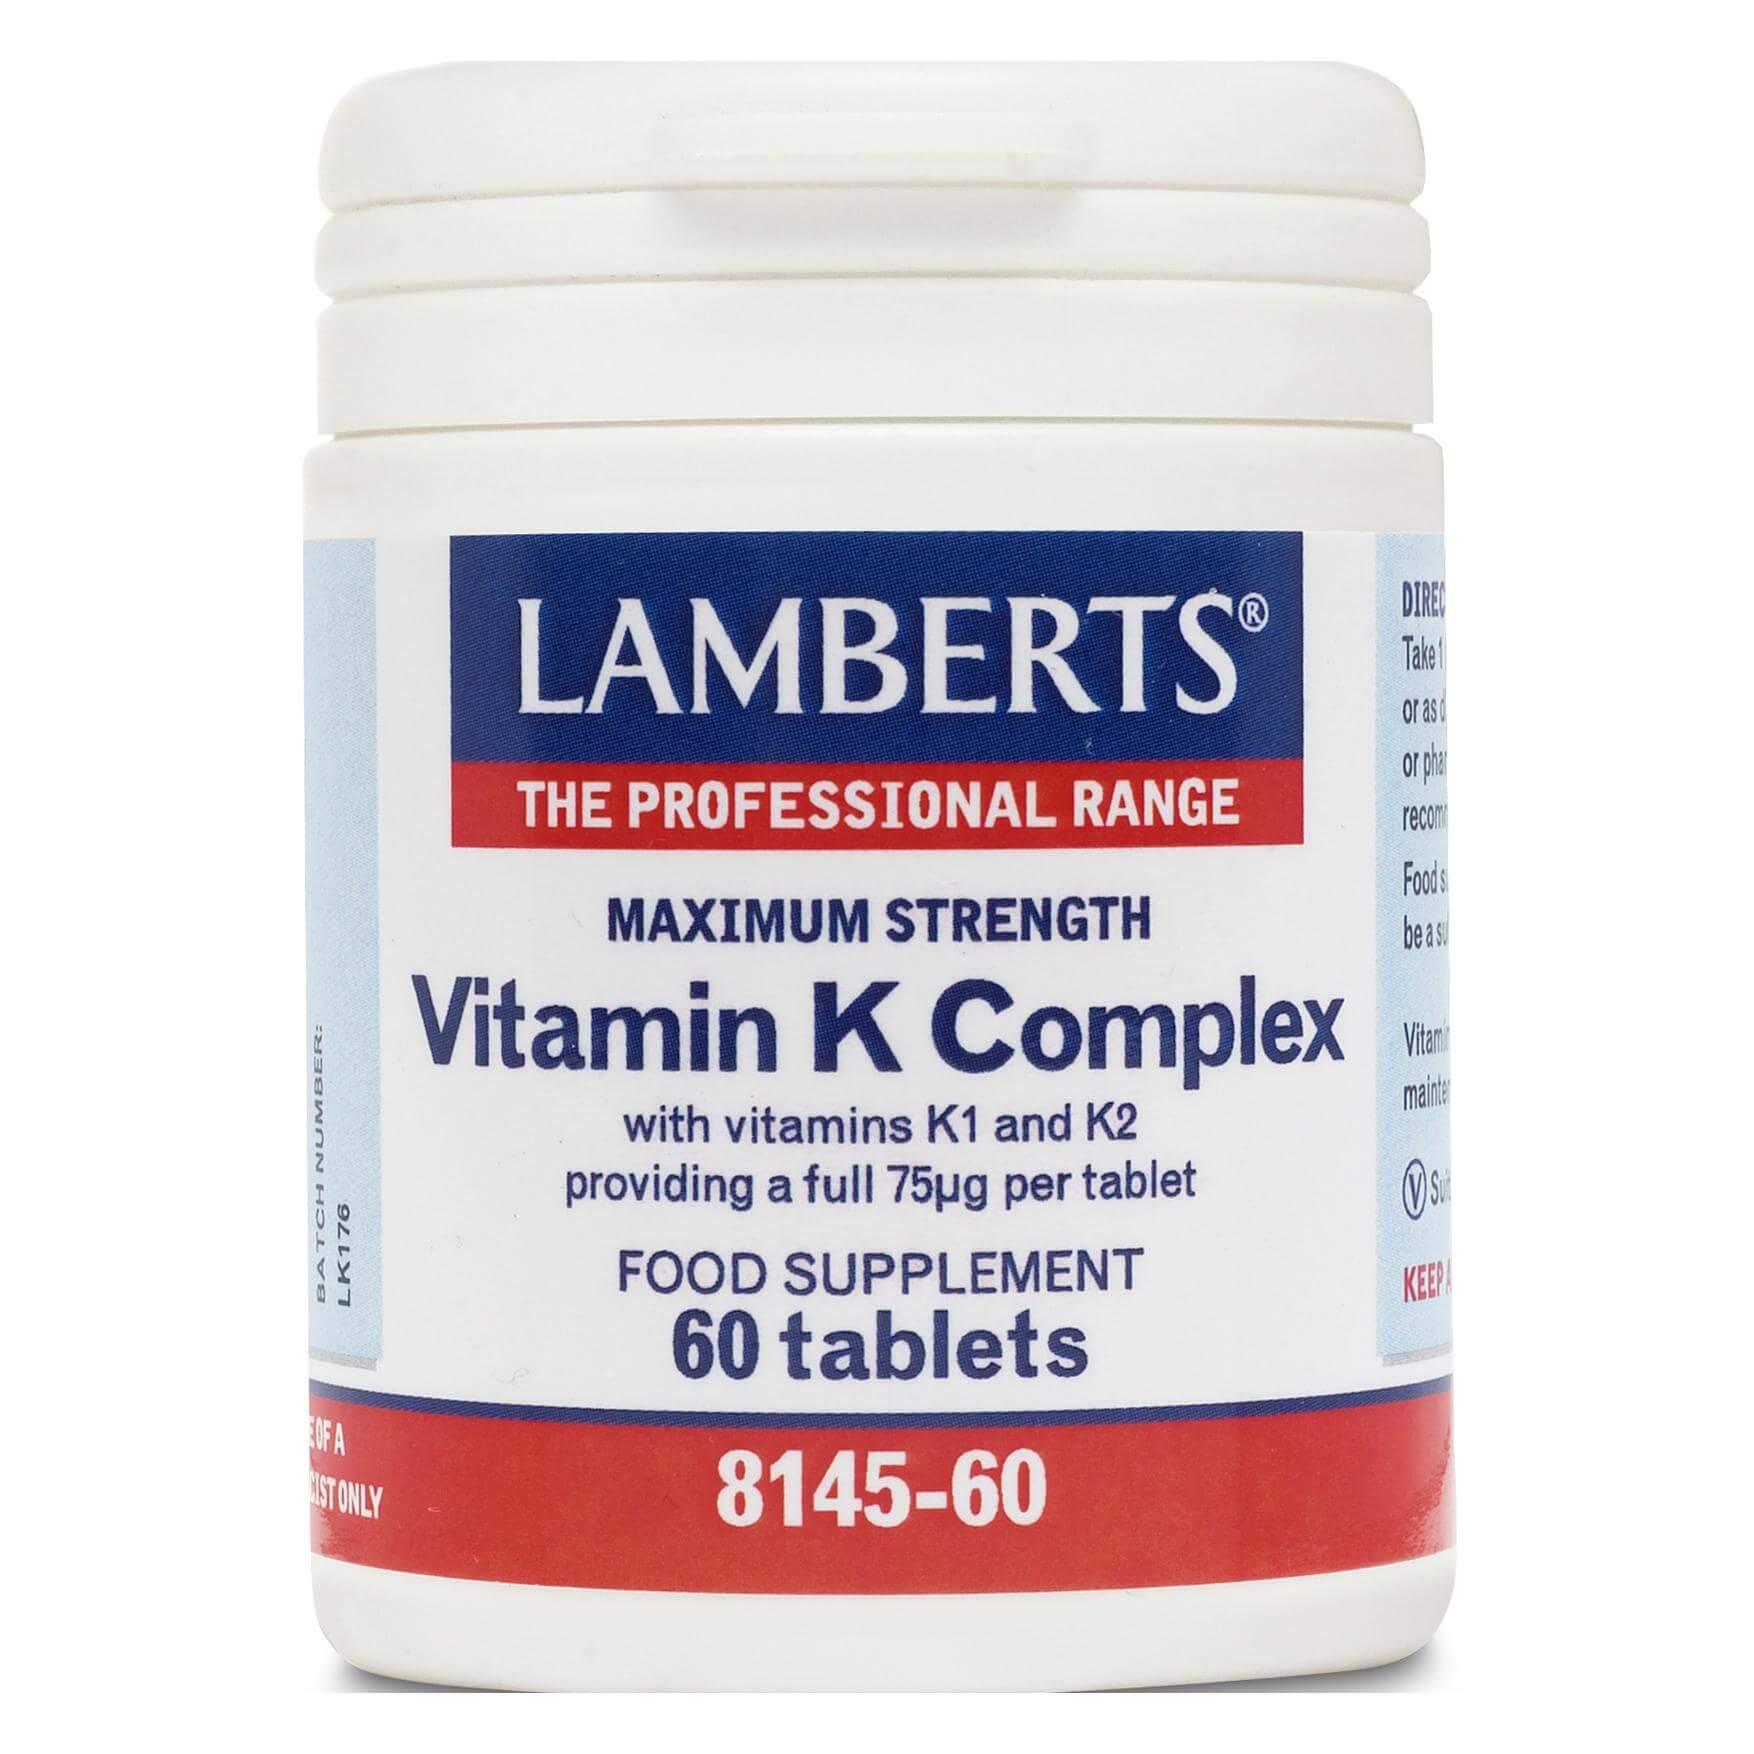 Lamberts Vitamin K Complex Συμπλήρωμα ΔιατροφήςΛιποδιαλυτής Βιταμίνης Κ που Παίζει Σημαντικό Ρόλο στην Πήξη του Αίματος60tabs